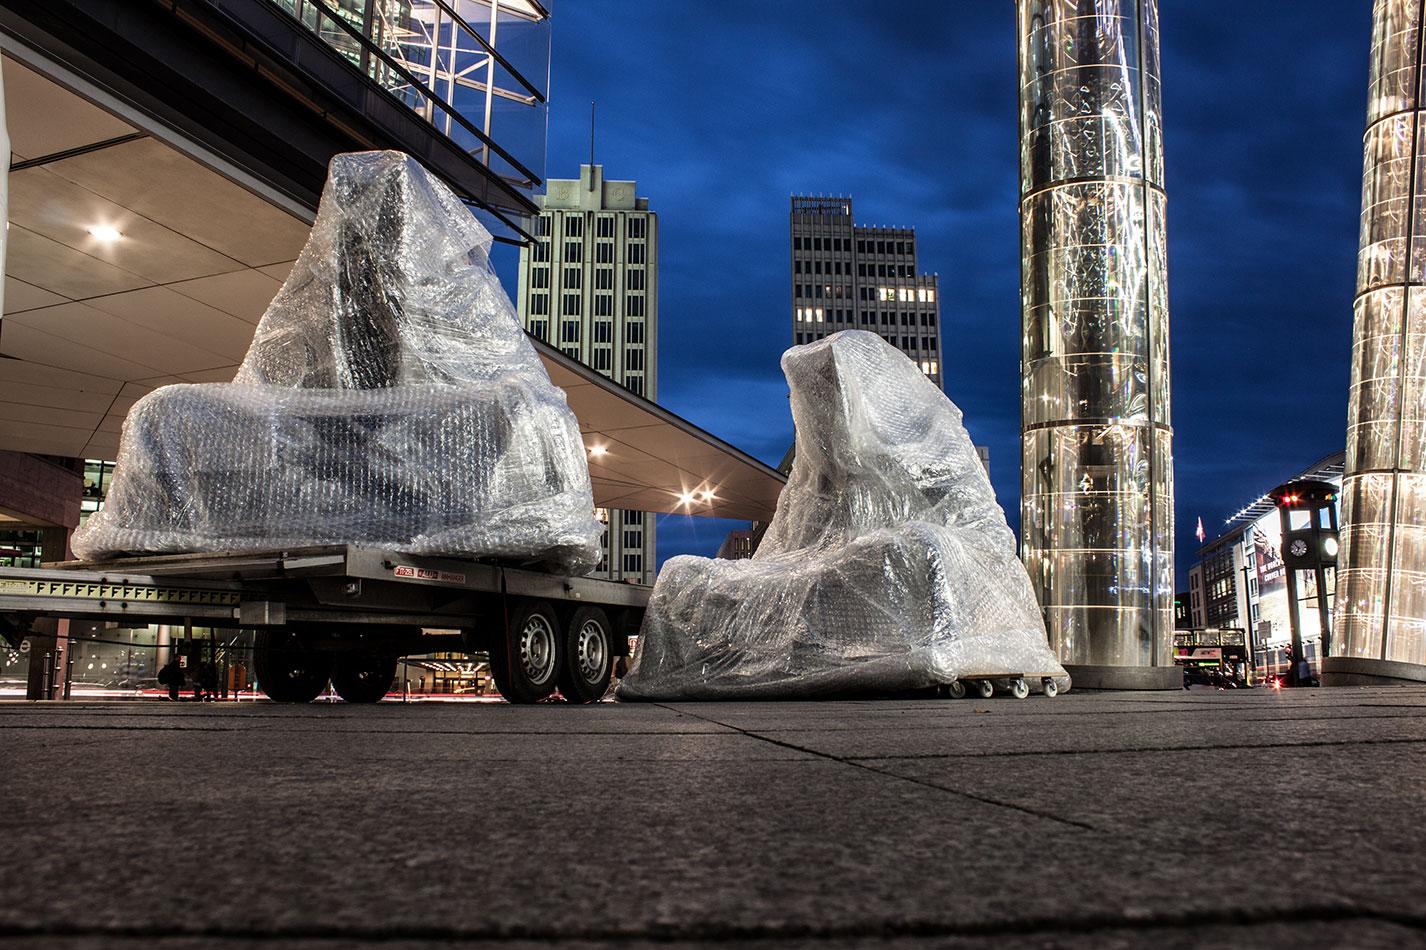 festival-of-lights-berlin-light-art-festival-contemporary-fine-art-design-show-guardiansof-time-manfred-kili-kielnhofer-sculpture-2863